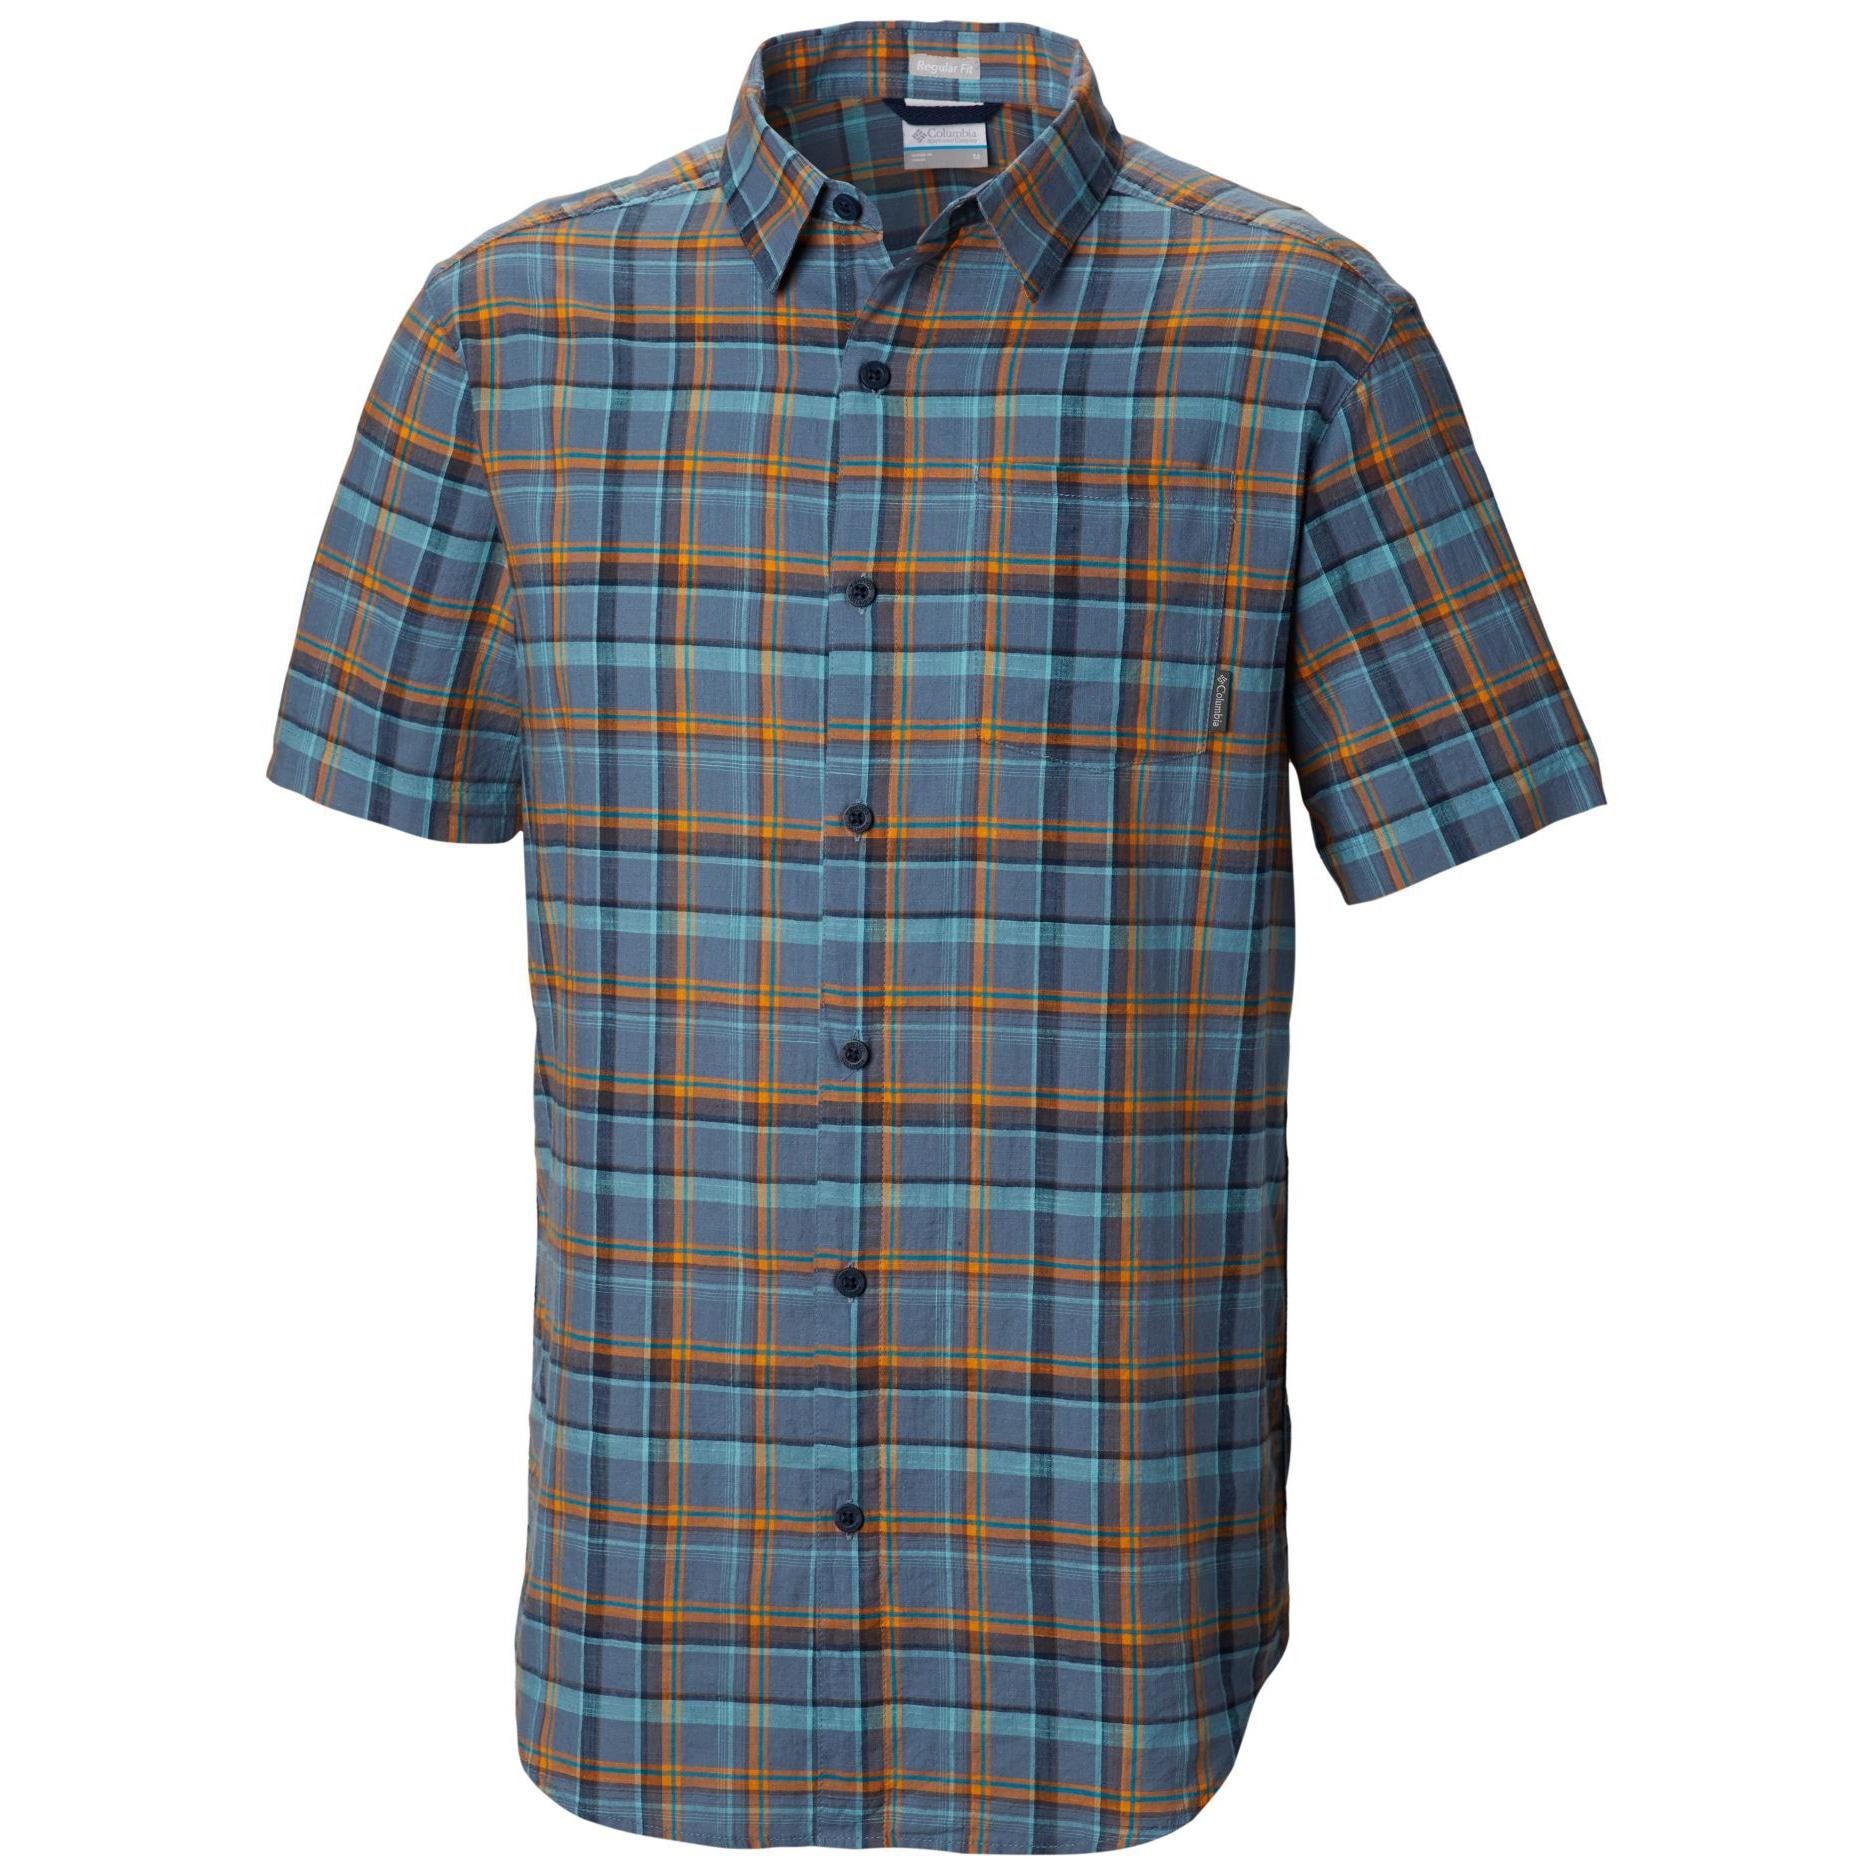 Under Exposure YD Shirt Short Sleeve - Men's